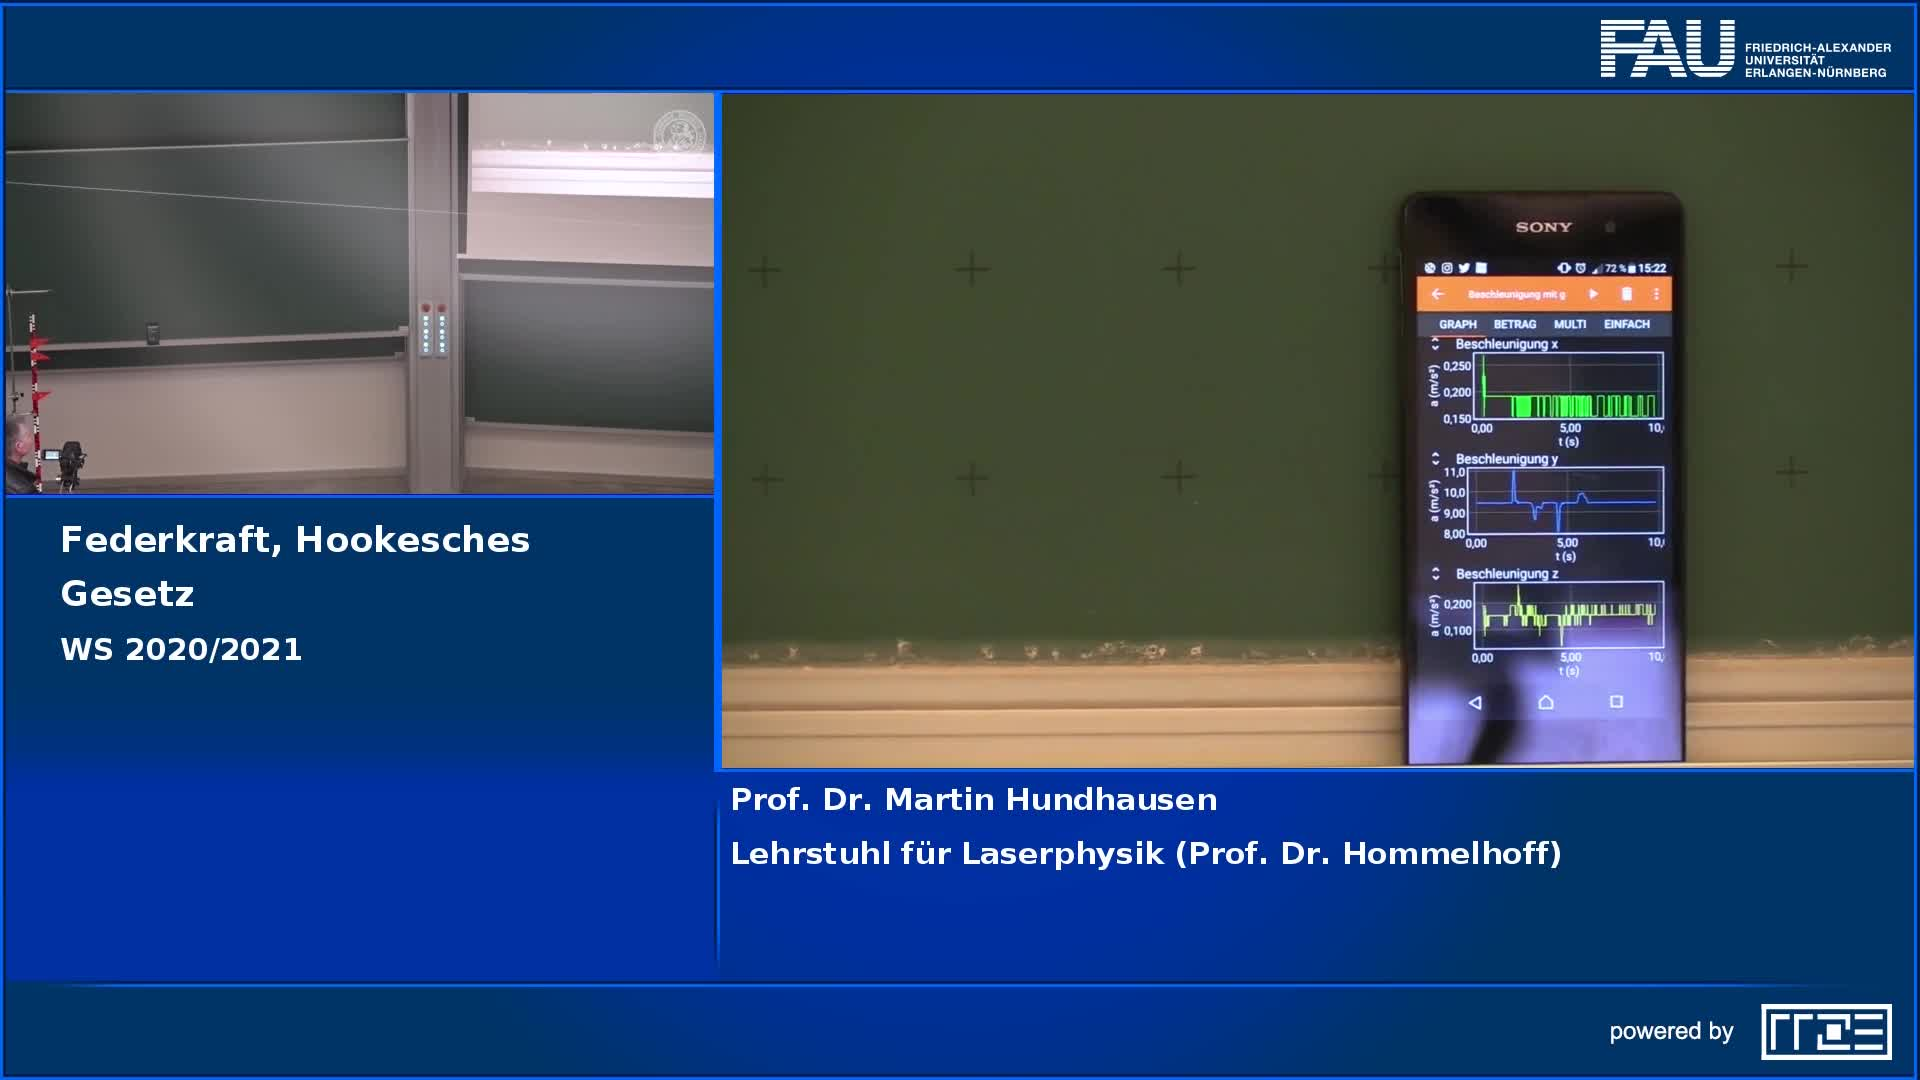 Federkraft, Hookesches Gesetz preview image